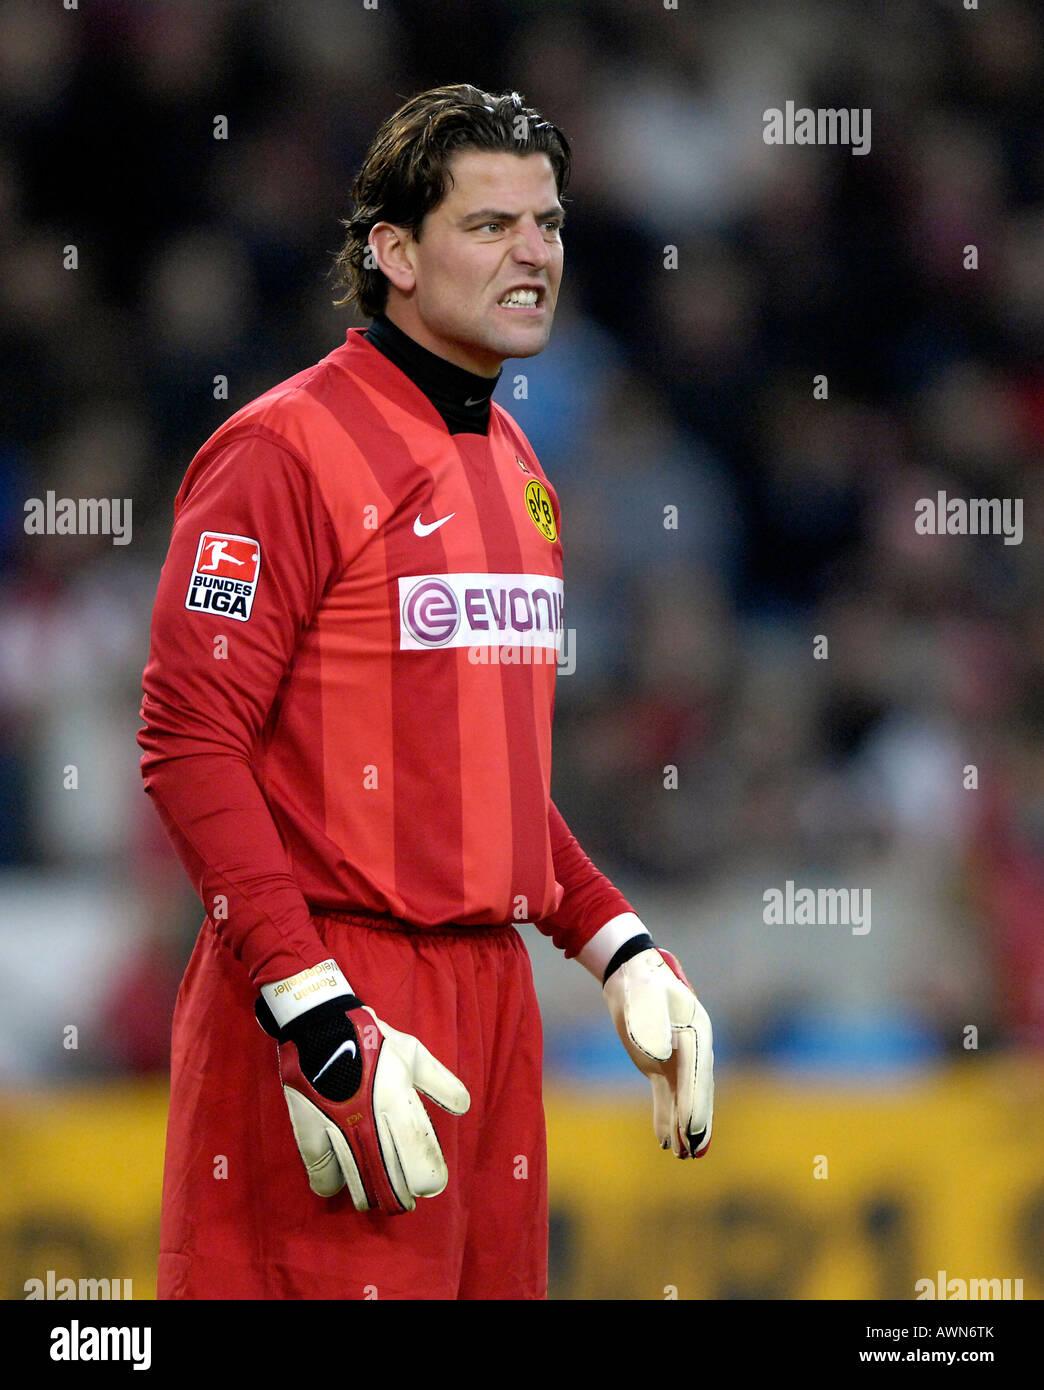 Goalkeeper Roman WEIDENFELLER Borussia Dortmund - Stock Image